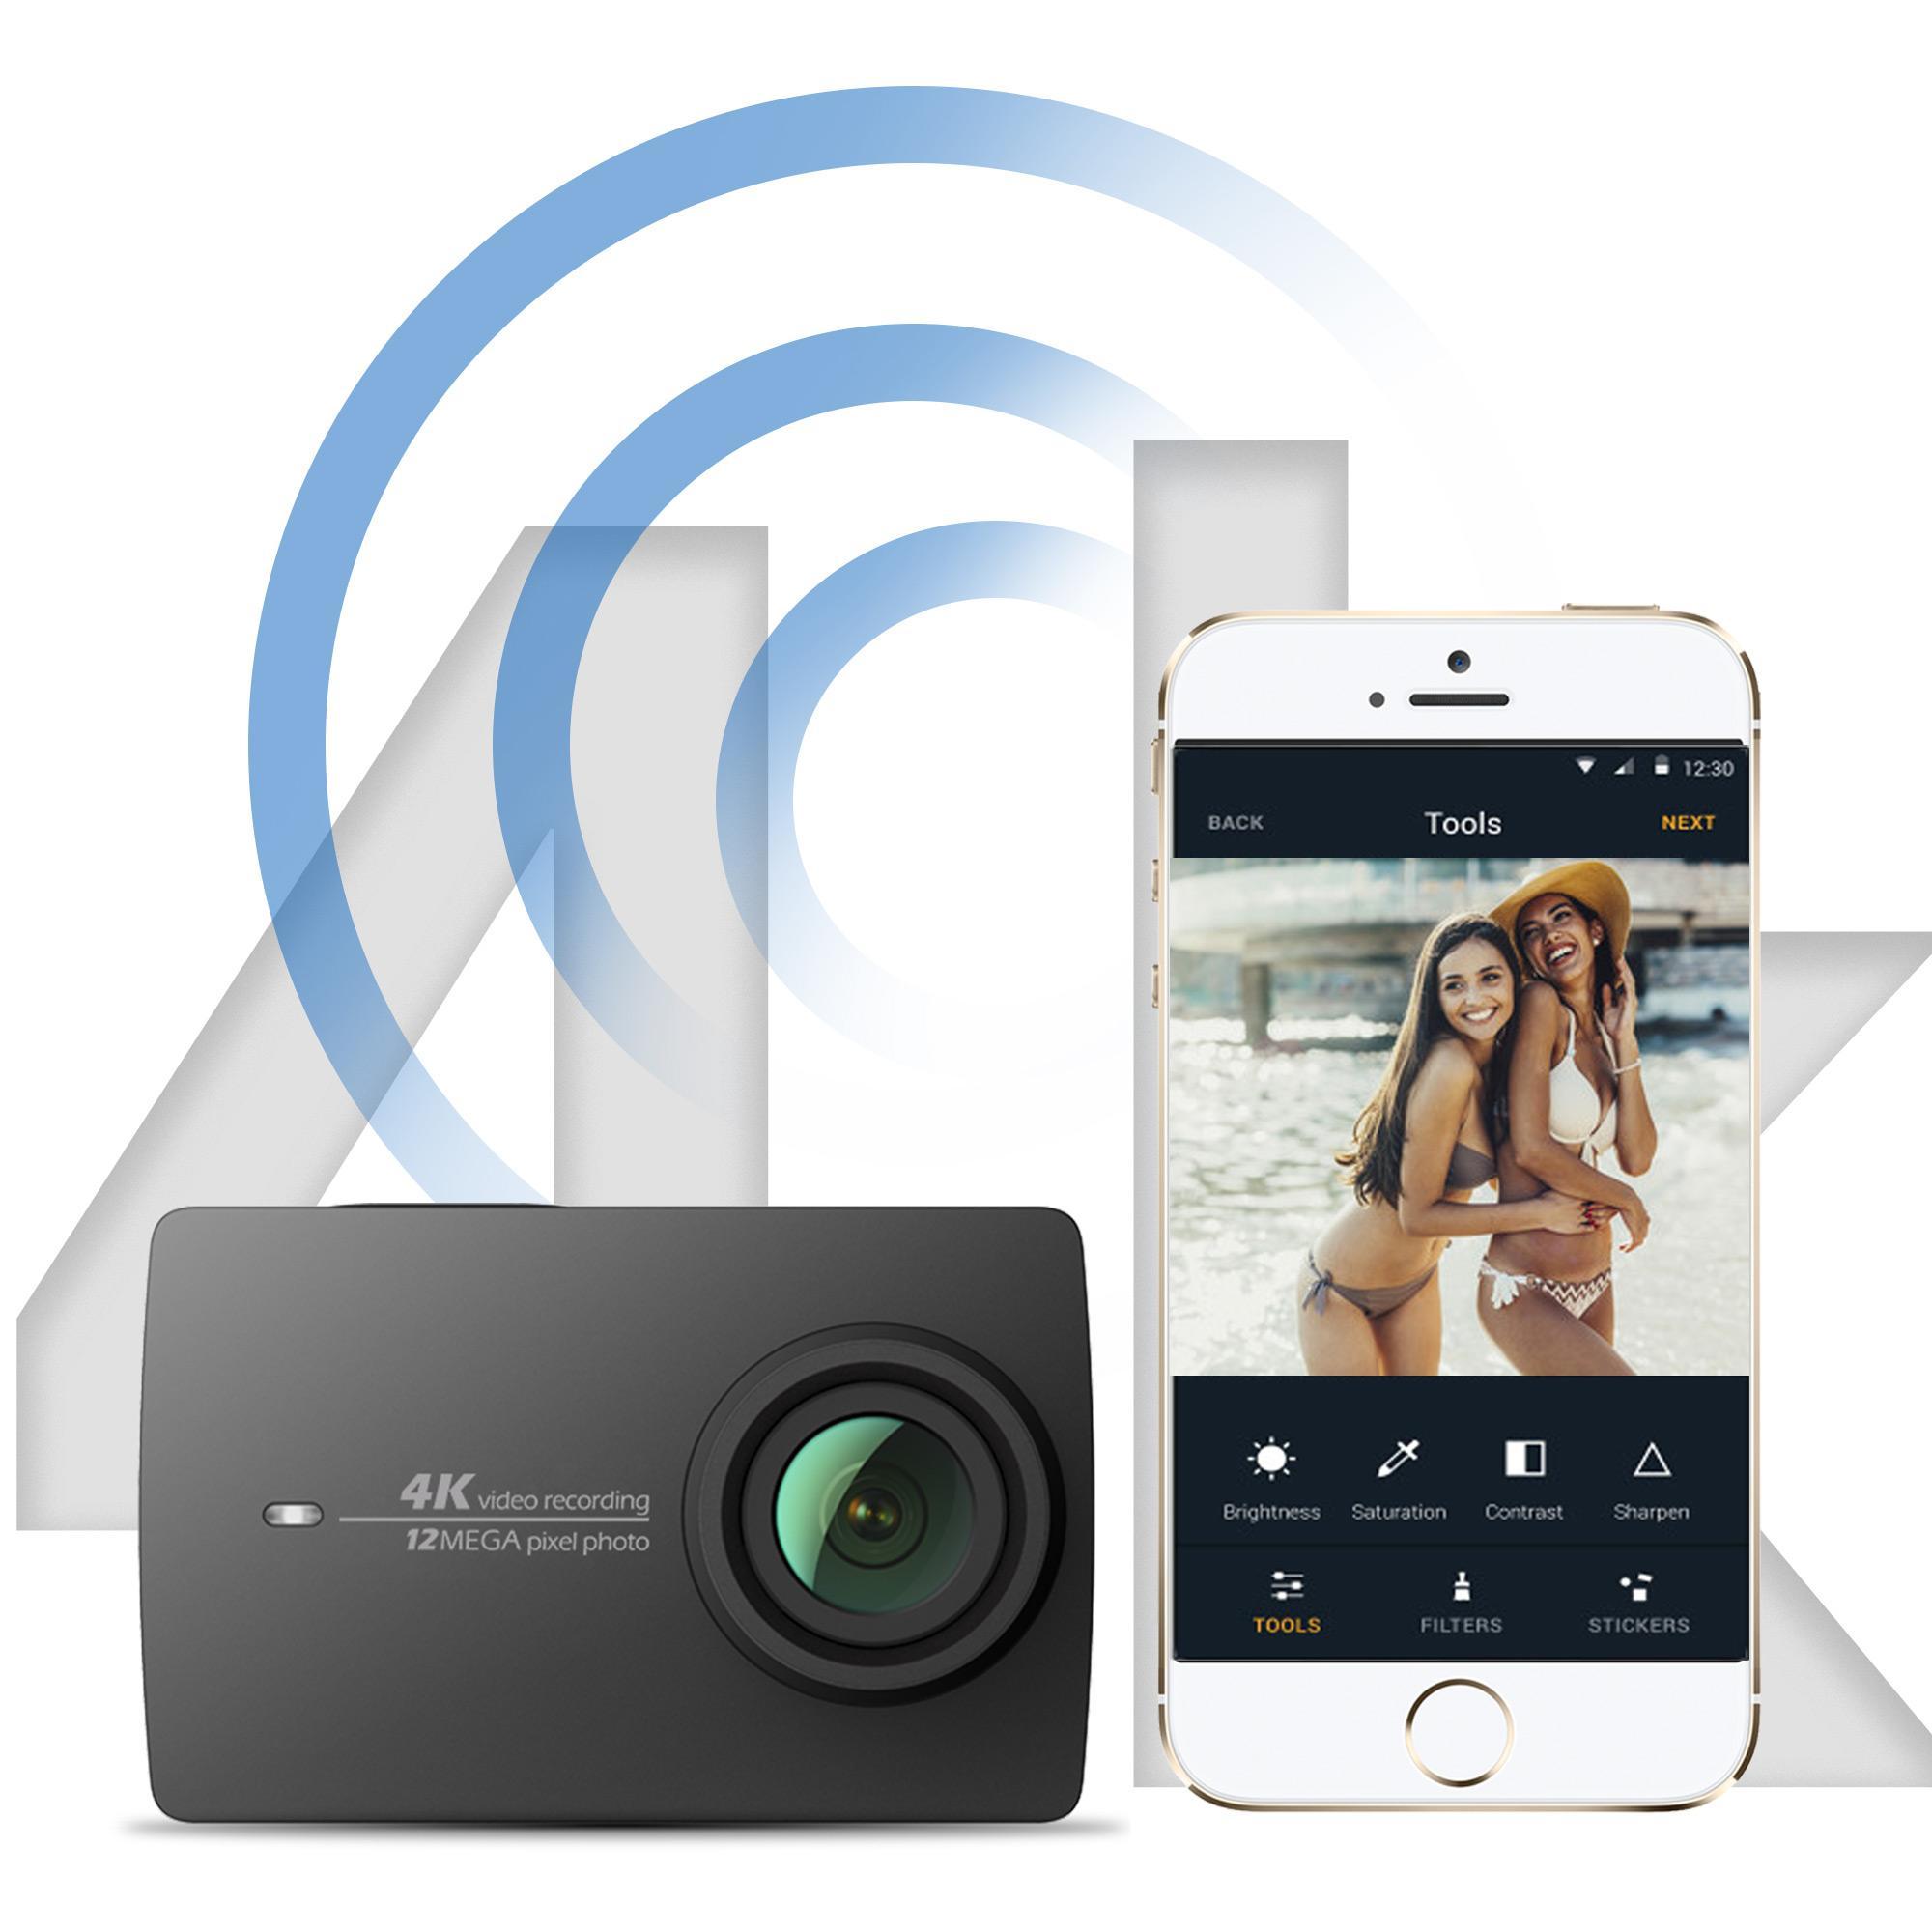 yi 4k action camera us edition night black. Black Bedroom Furniture Sets. Home Design Ideas